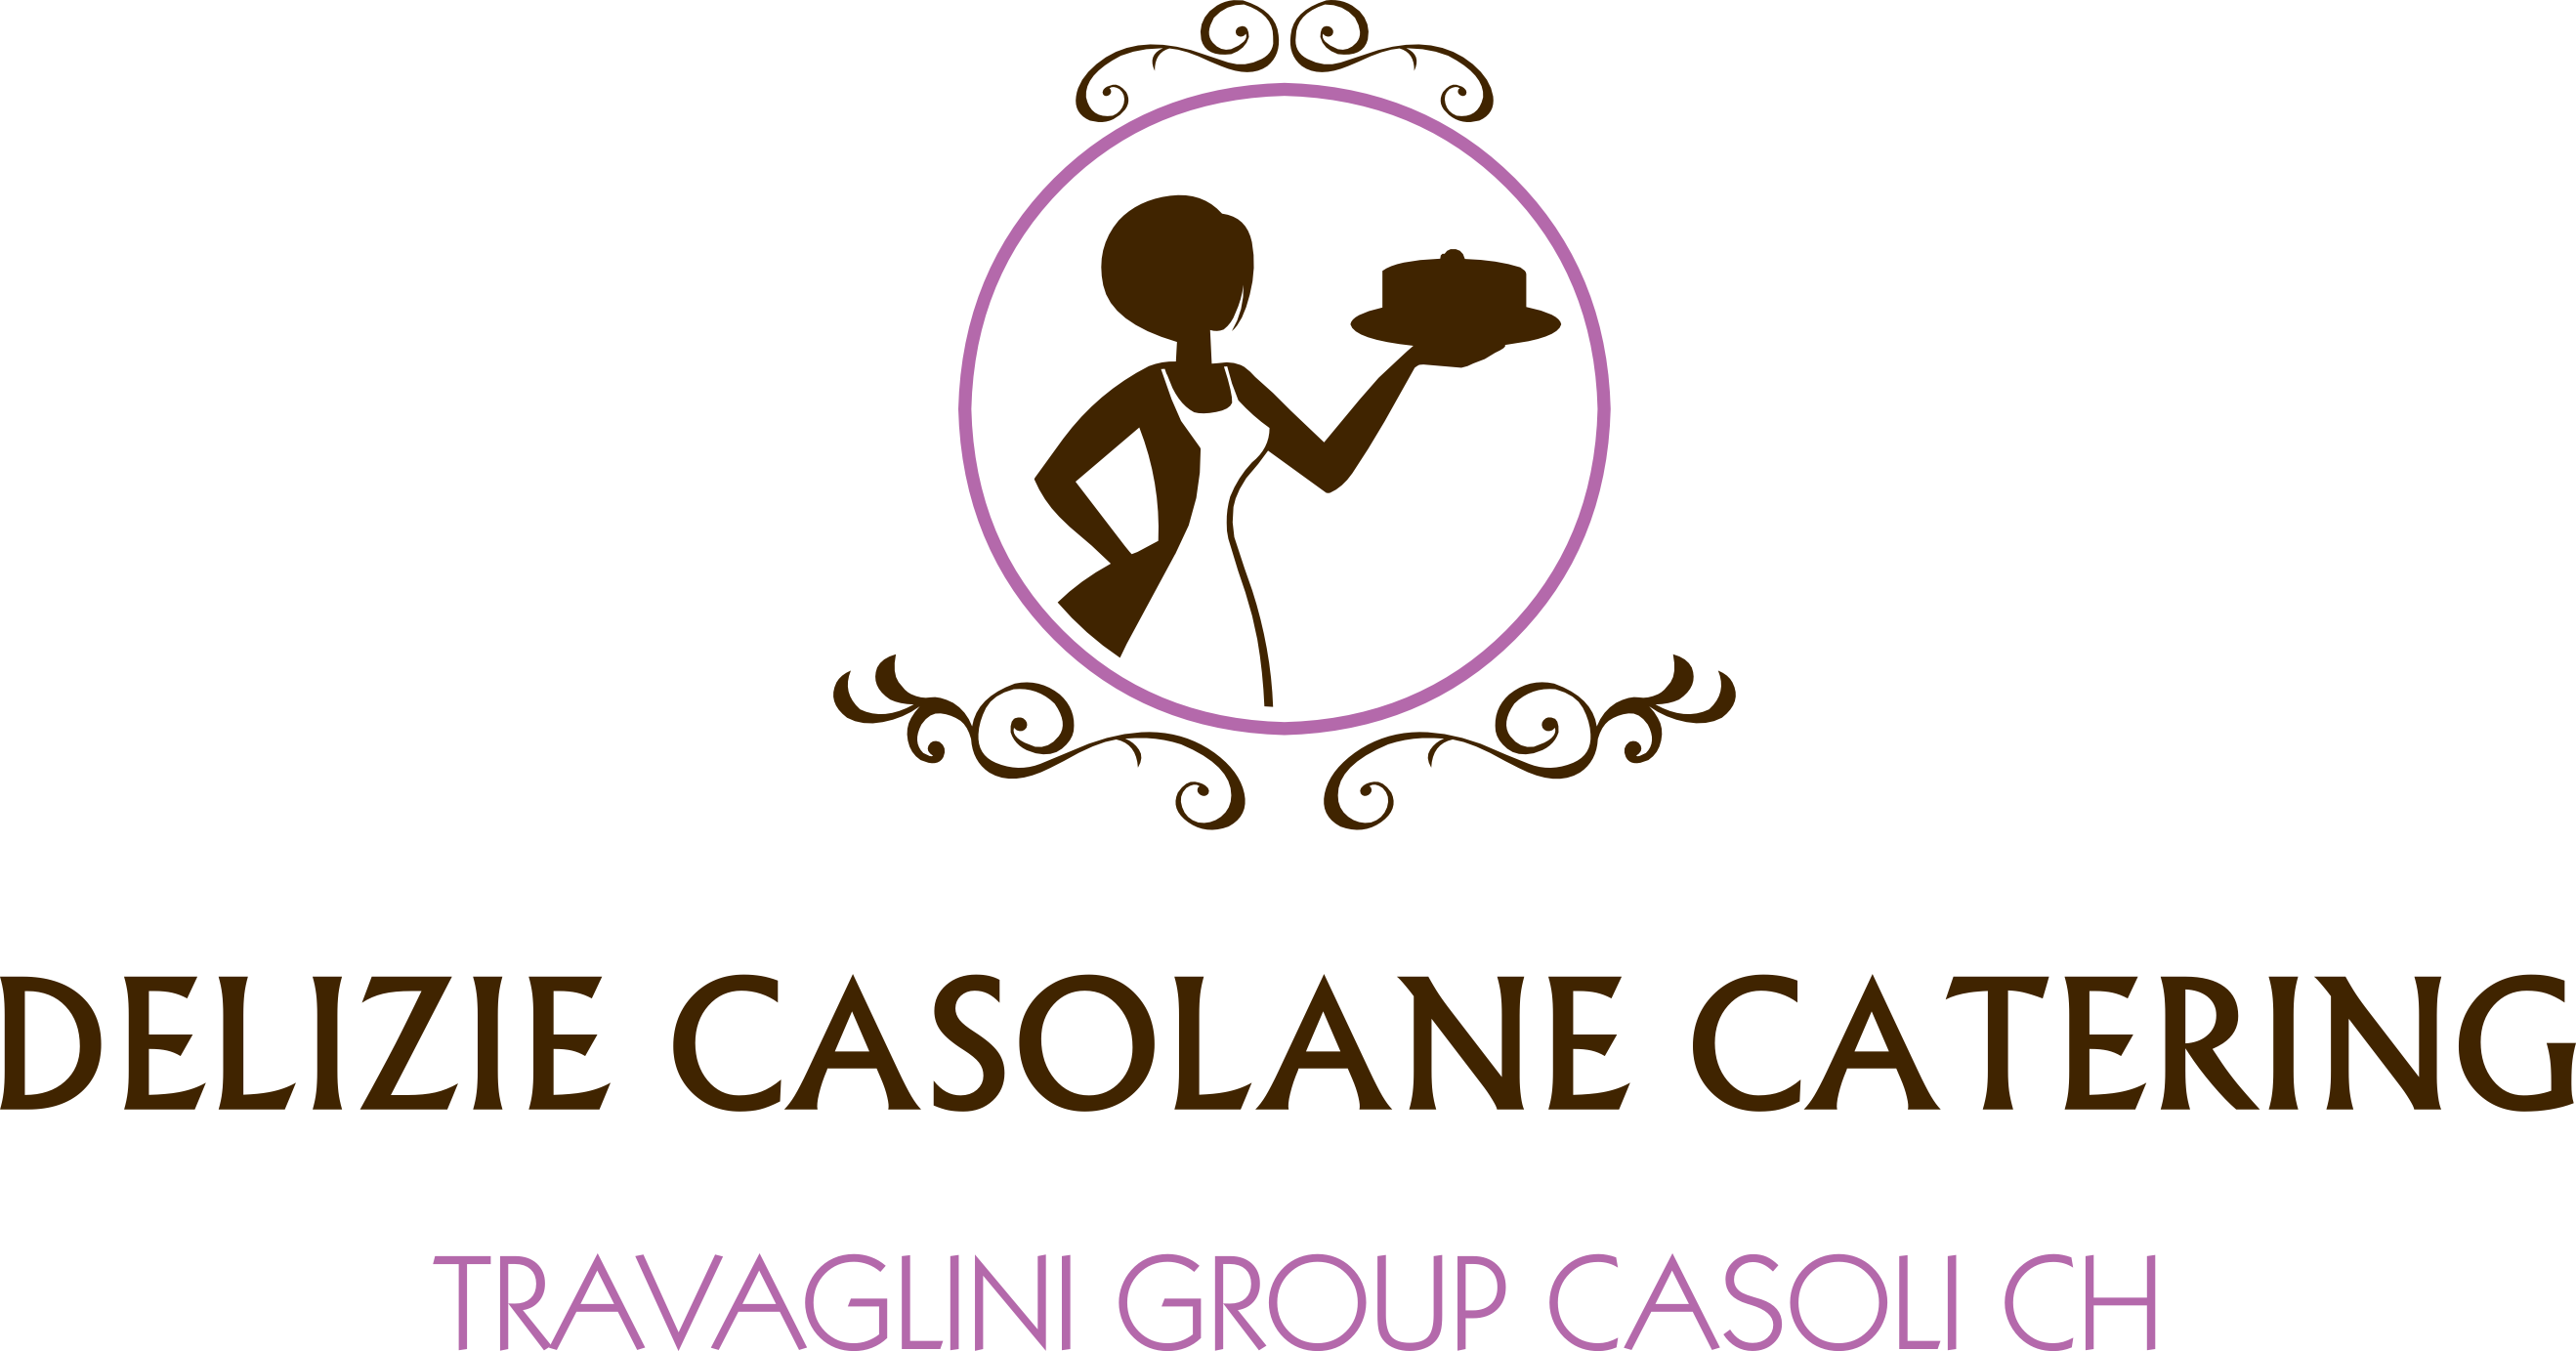 Delizie Casolane